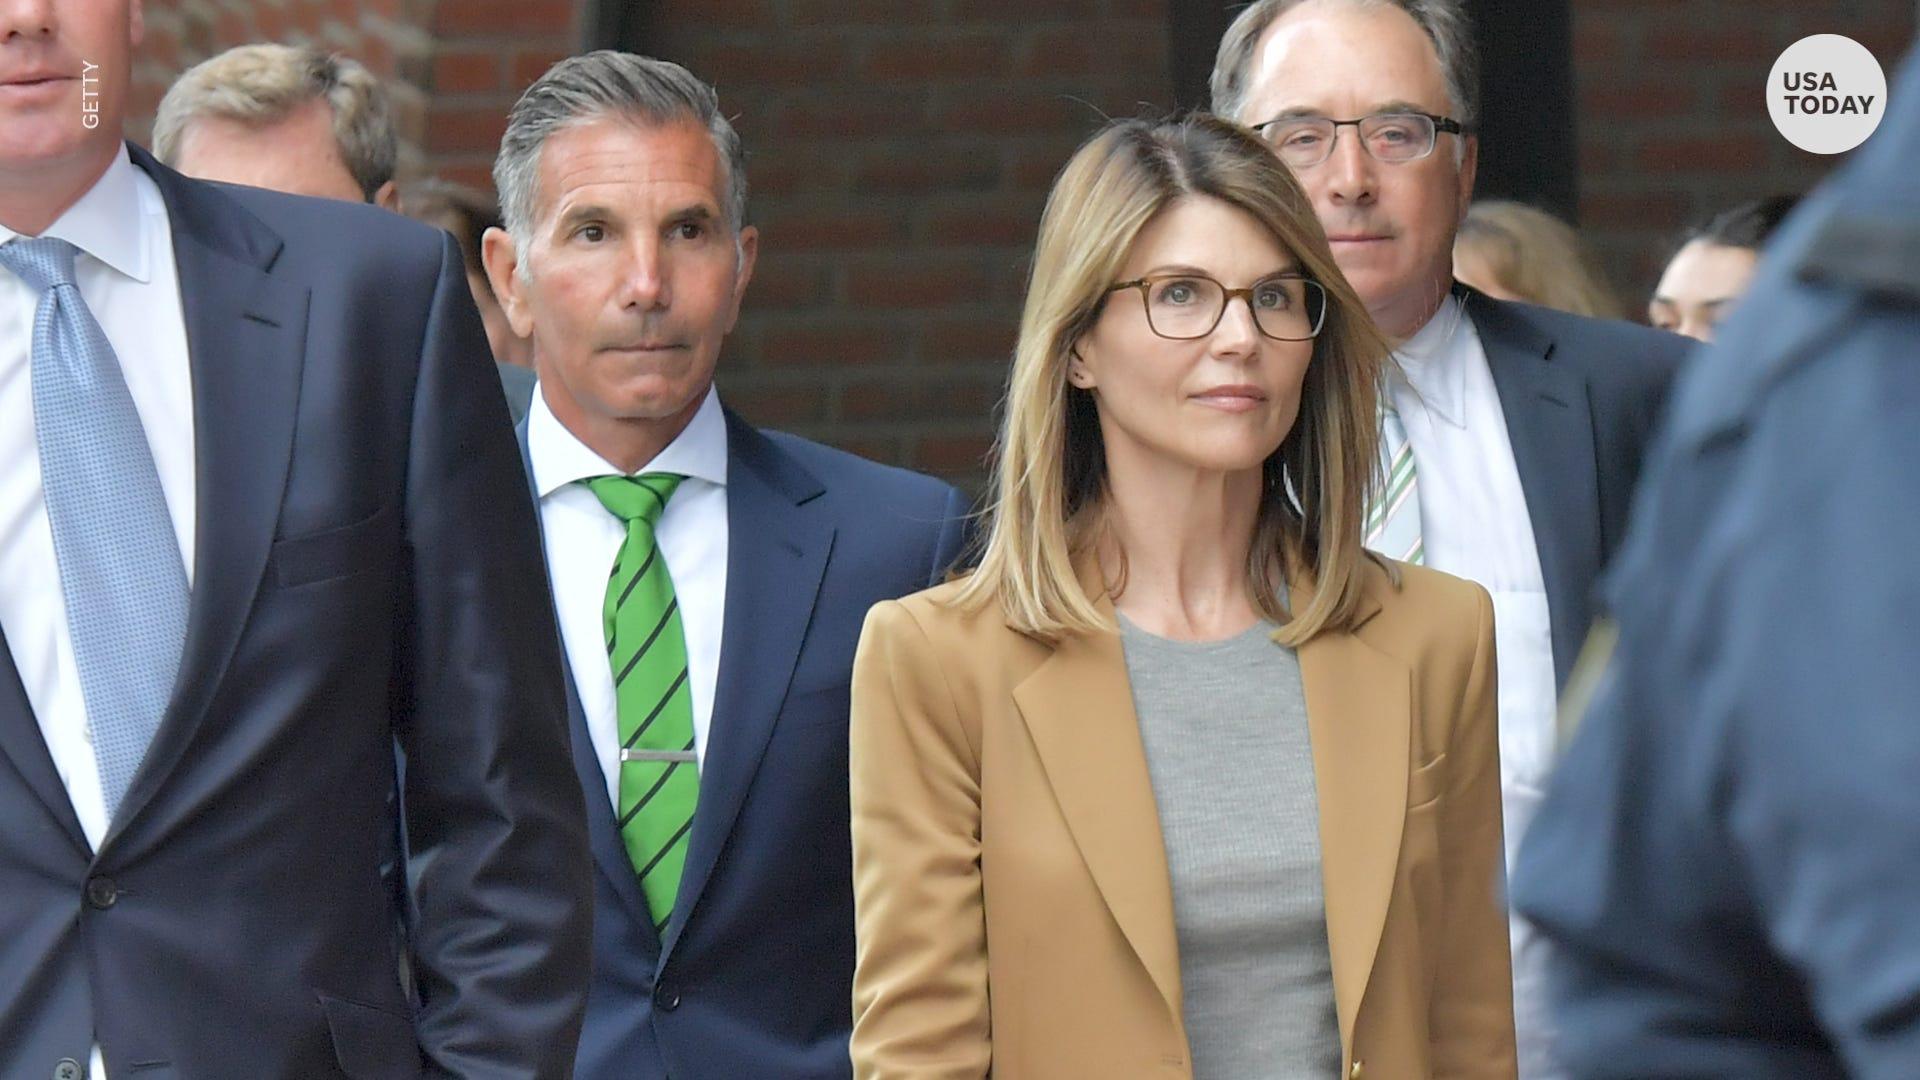 Lori Loughlin Husband Sentenced In College Admissions Scandal